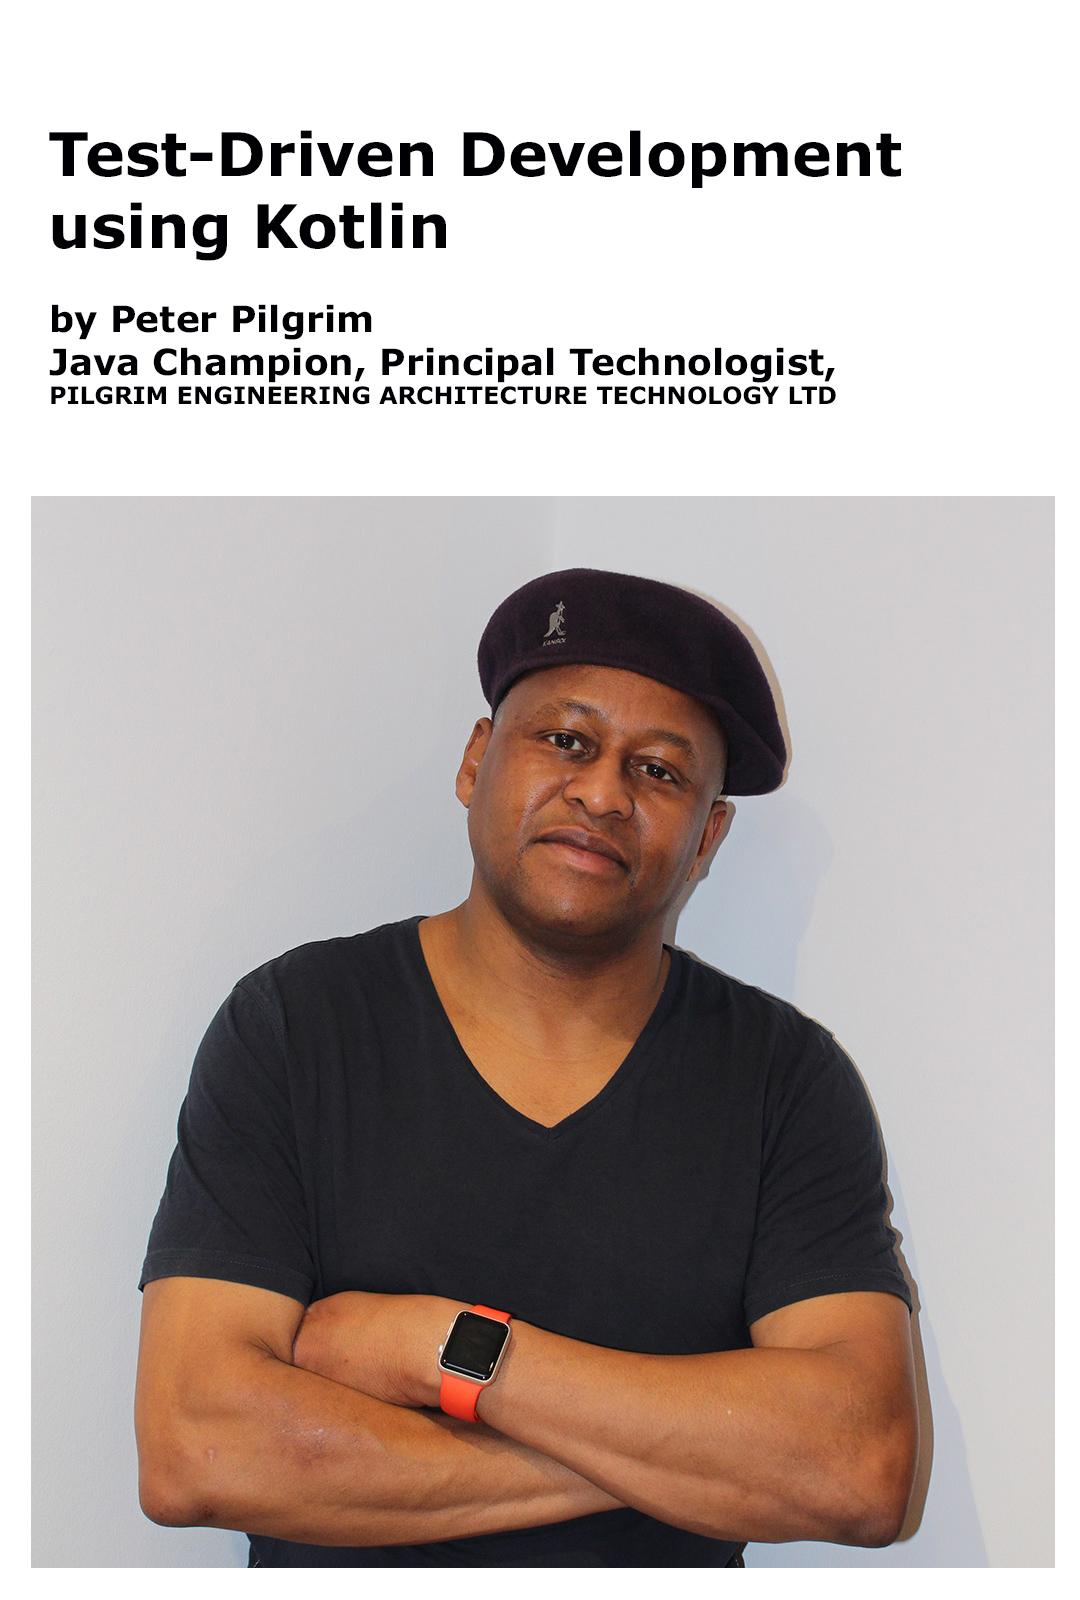 Peter Pilgrim